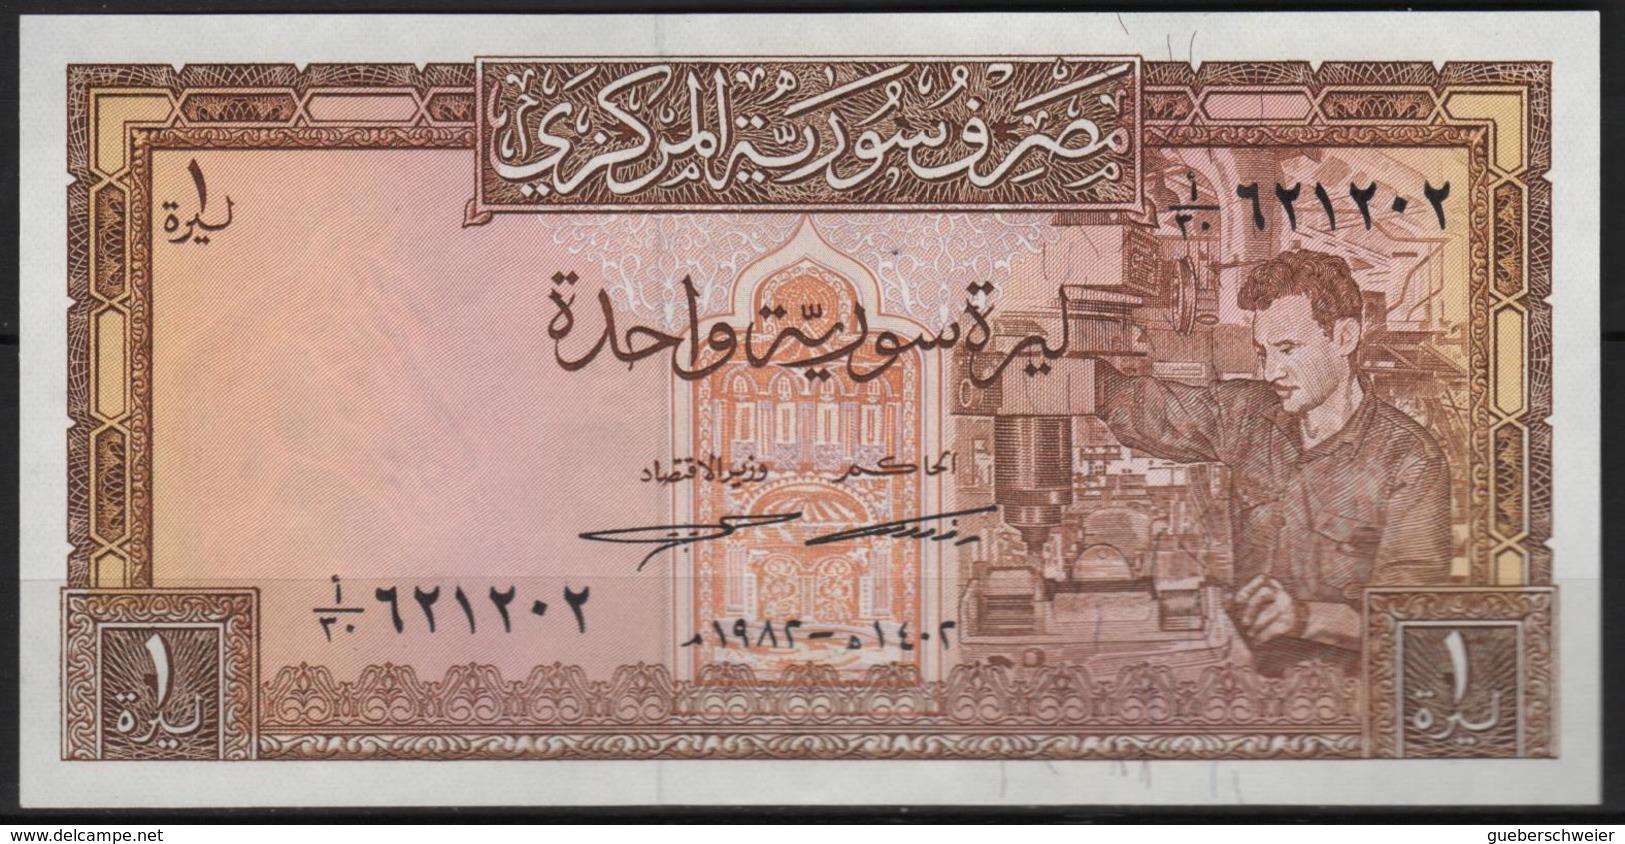 B 120 - SYRIE Billet De 1 Pound De 1982 état Neuf 1er Choix - Syrie